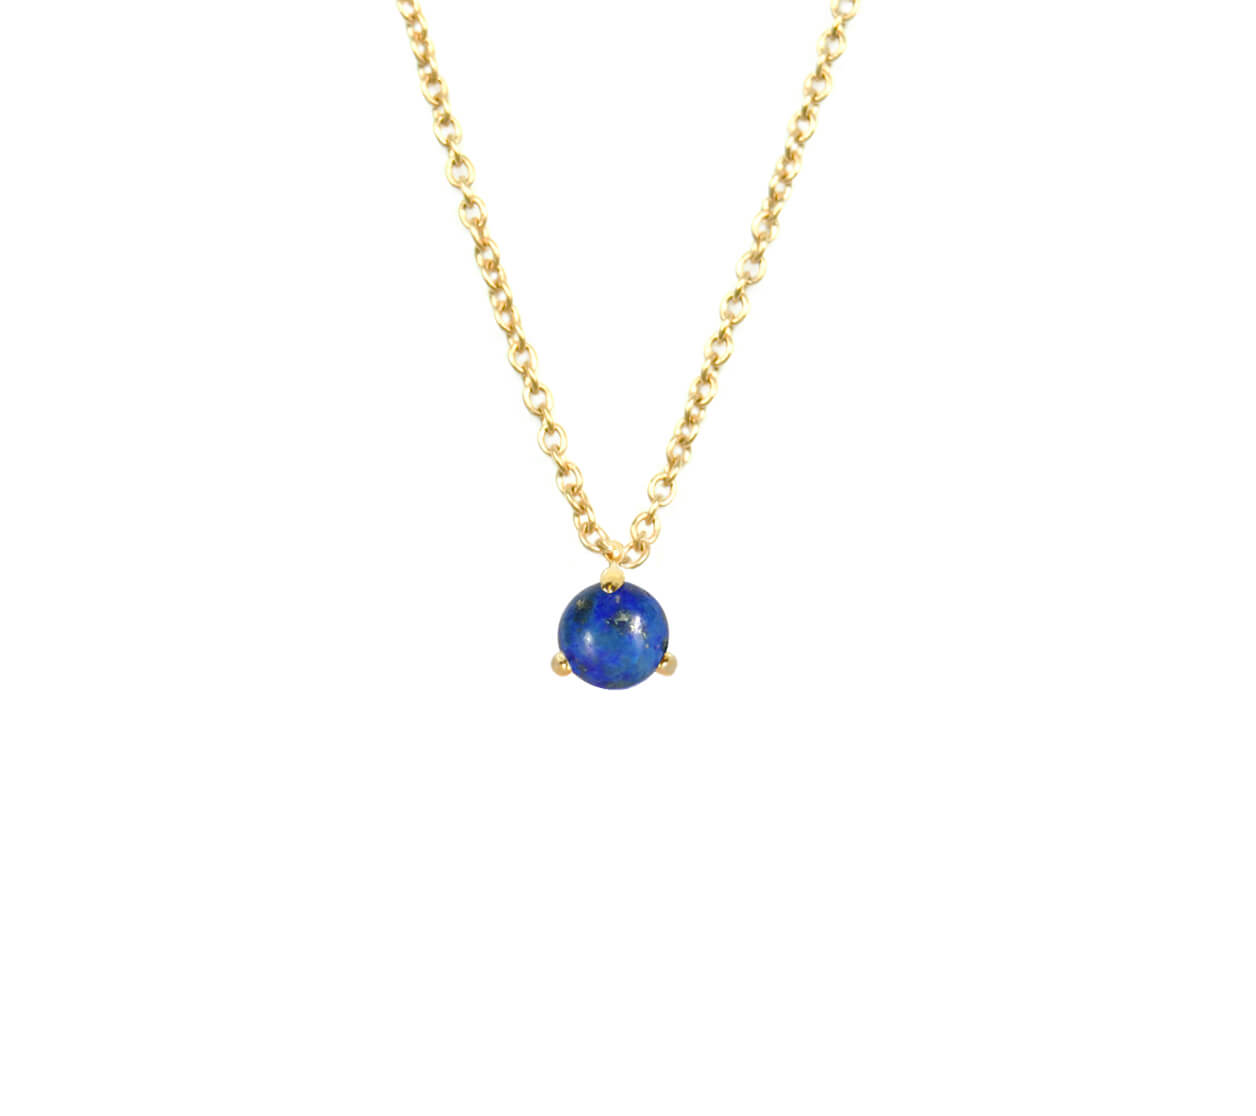 Mas Jewelz necklace Cabuchon Lapis Lazuli Gold